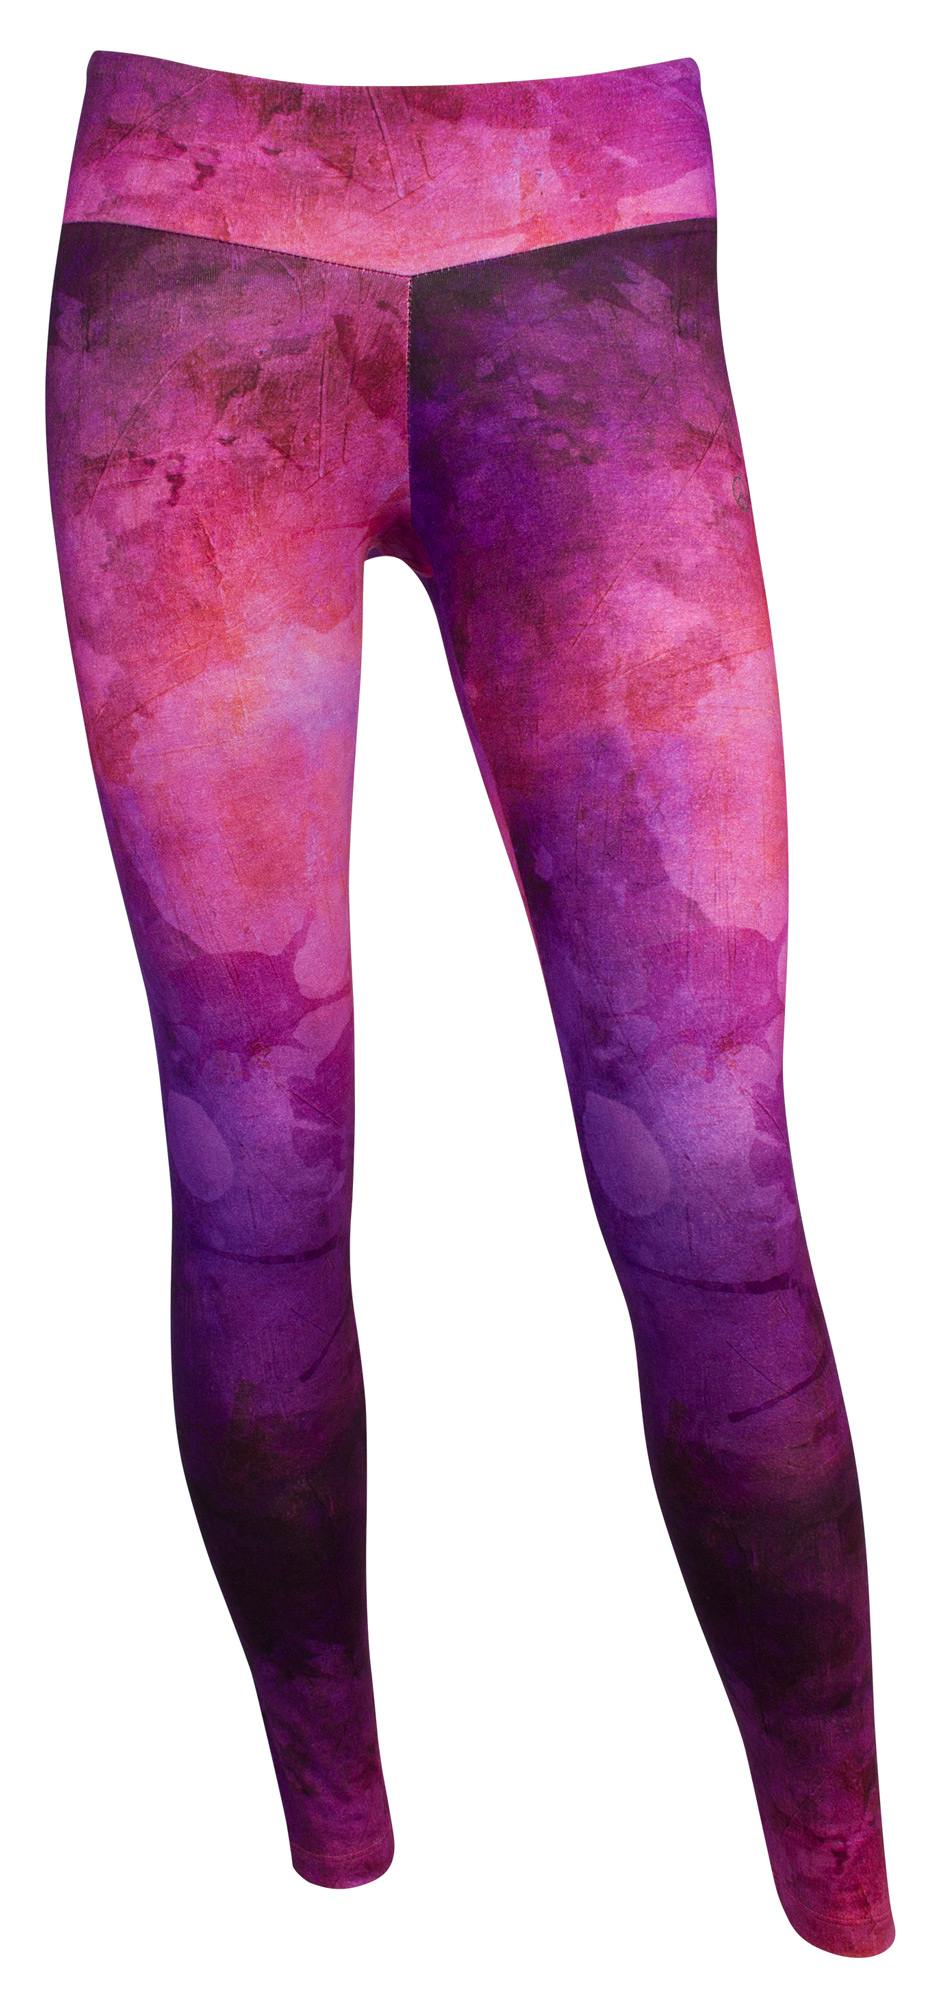 "Yoga-Leggings ""Amethyst"" - purple"